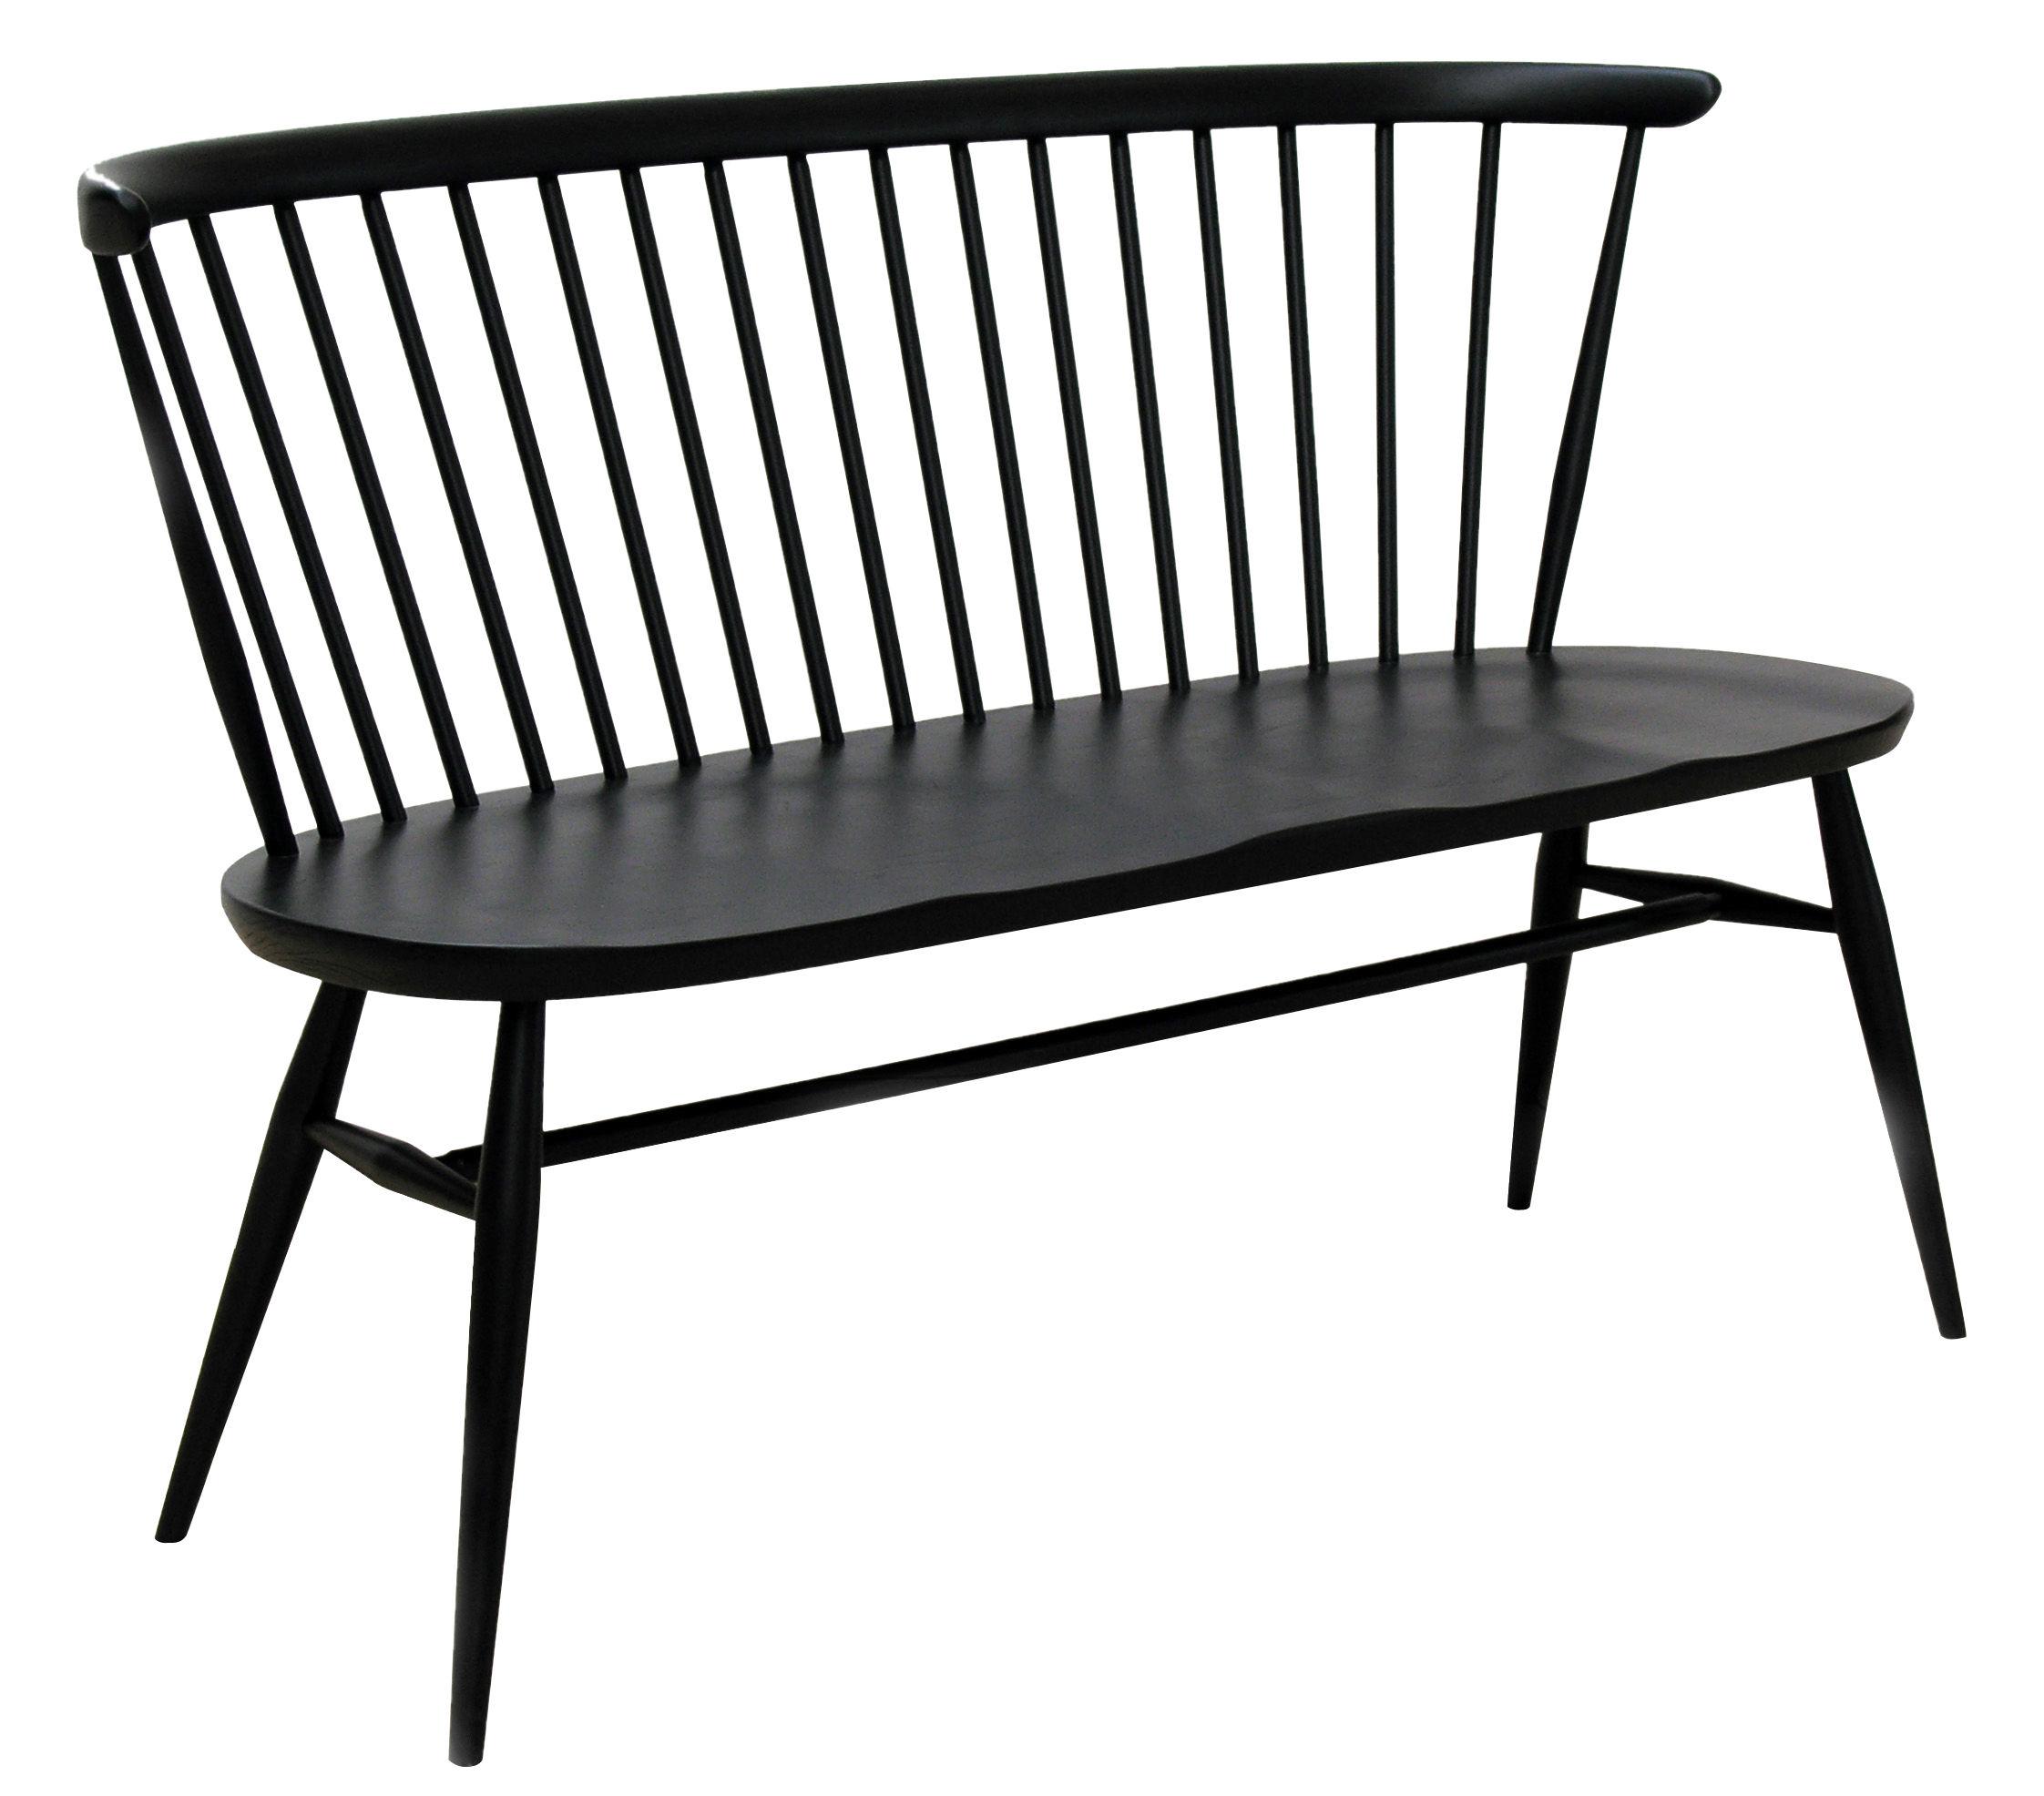 Banc Avec Dossier Love Seat Ercol Noir Made In Design